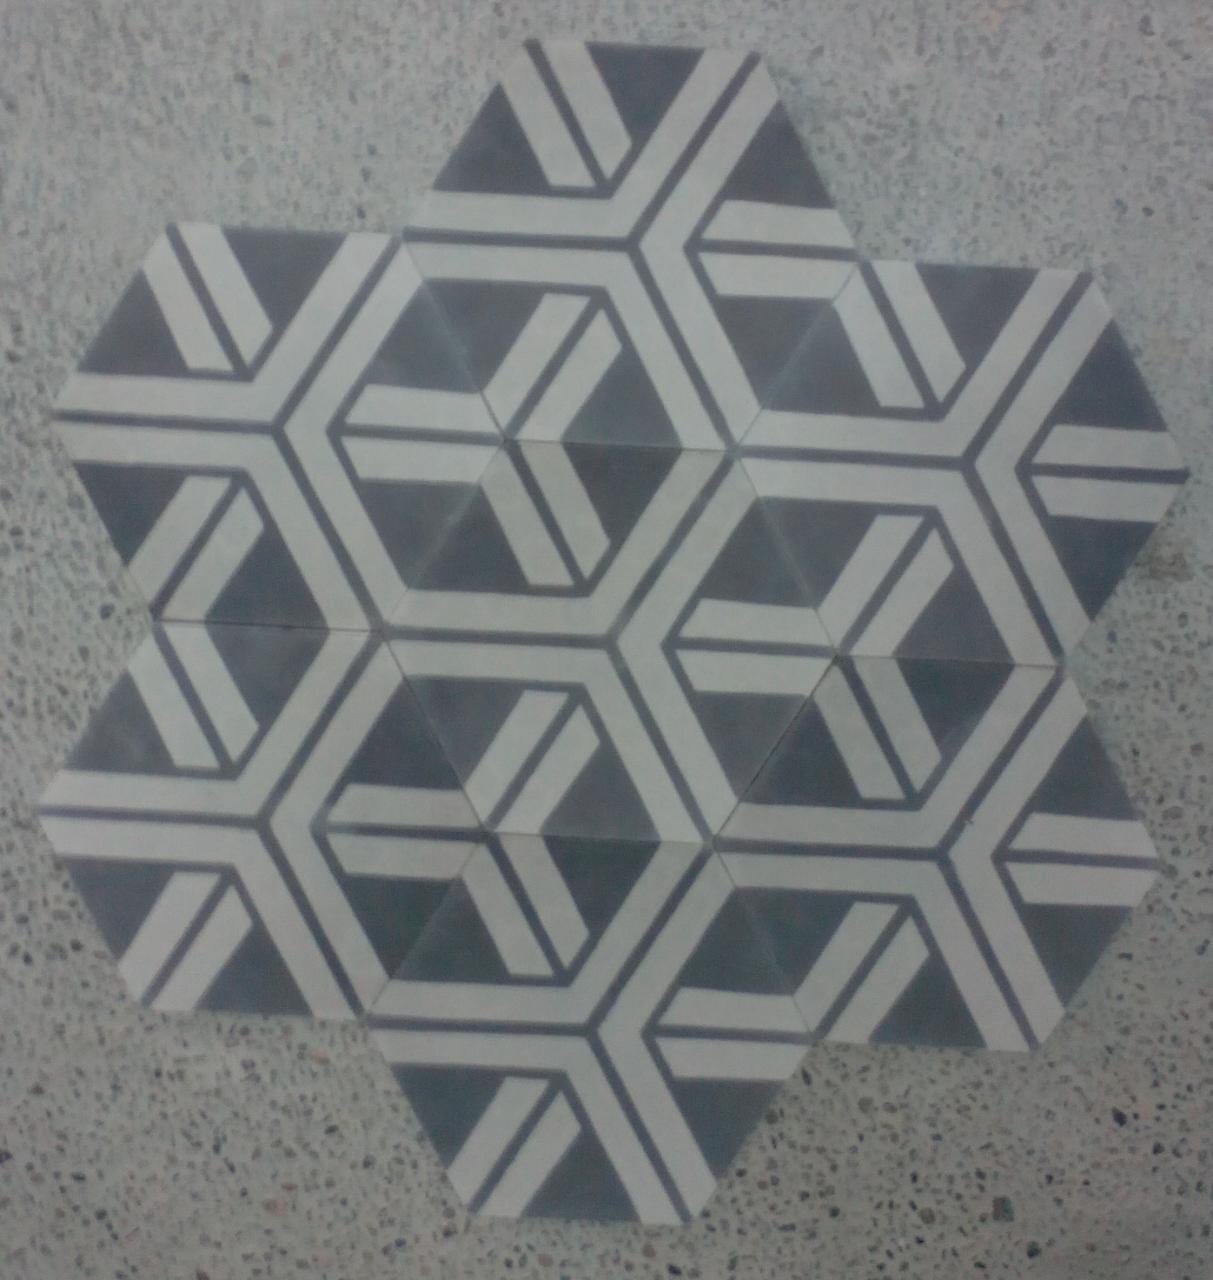 carreau de ciment hexagonal racine arborescence sud ouest. Black Bedroom Furniture Sets. Home Design Ideas